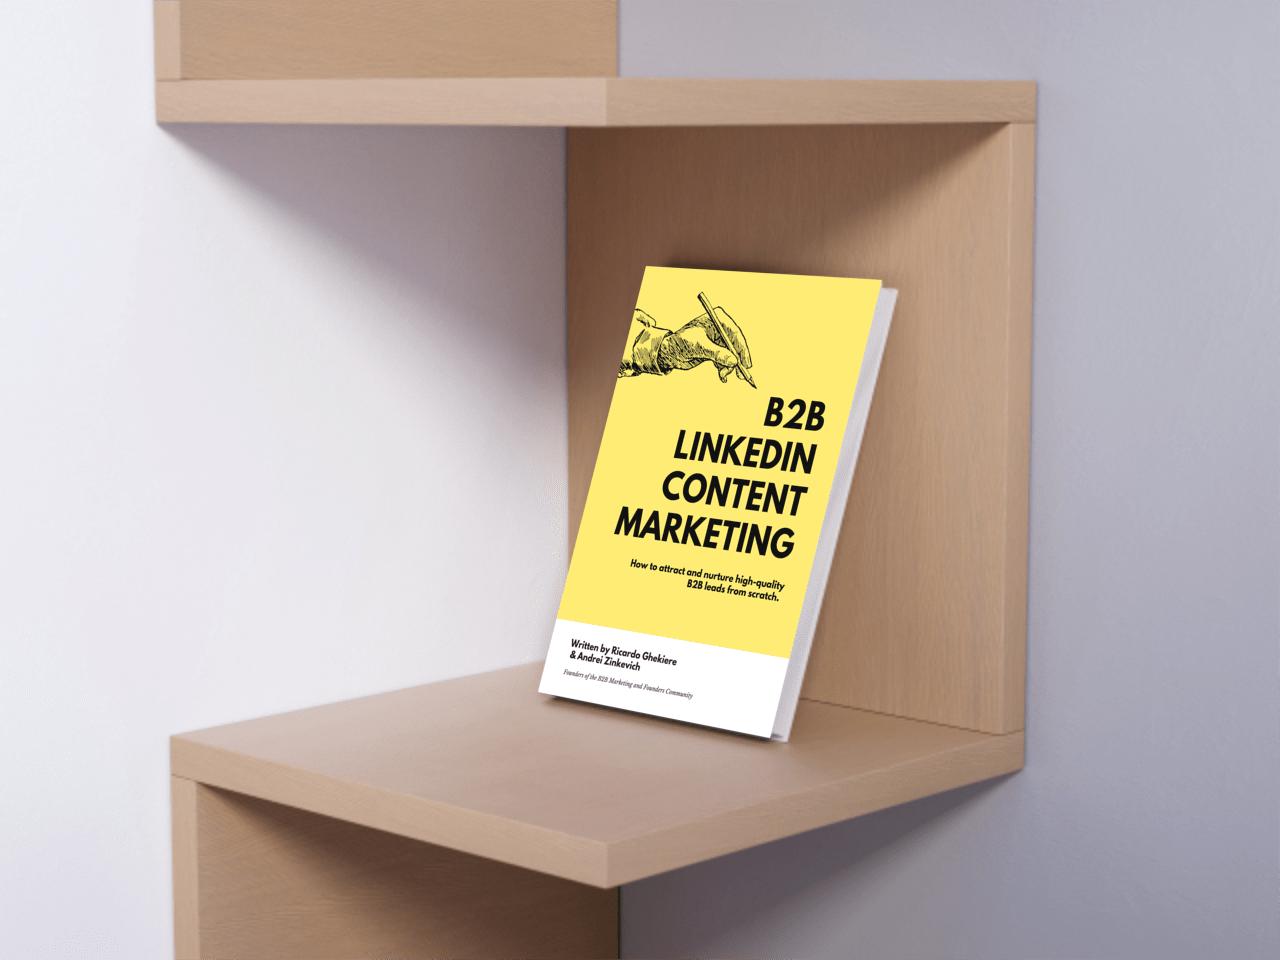 B2B LinkedIn Content Marketing Book